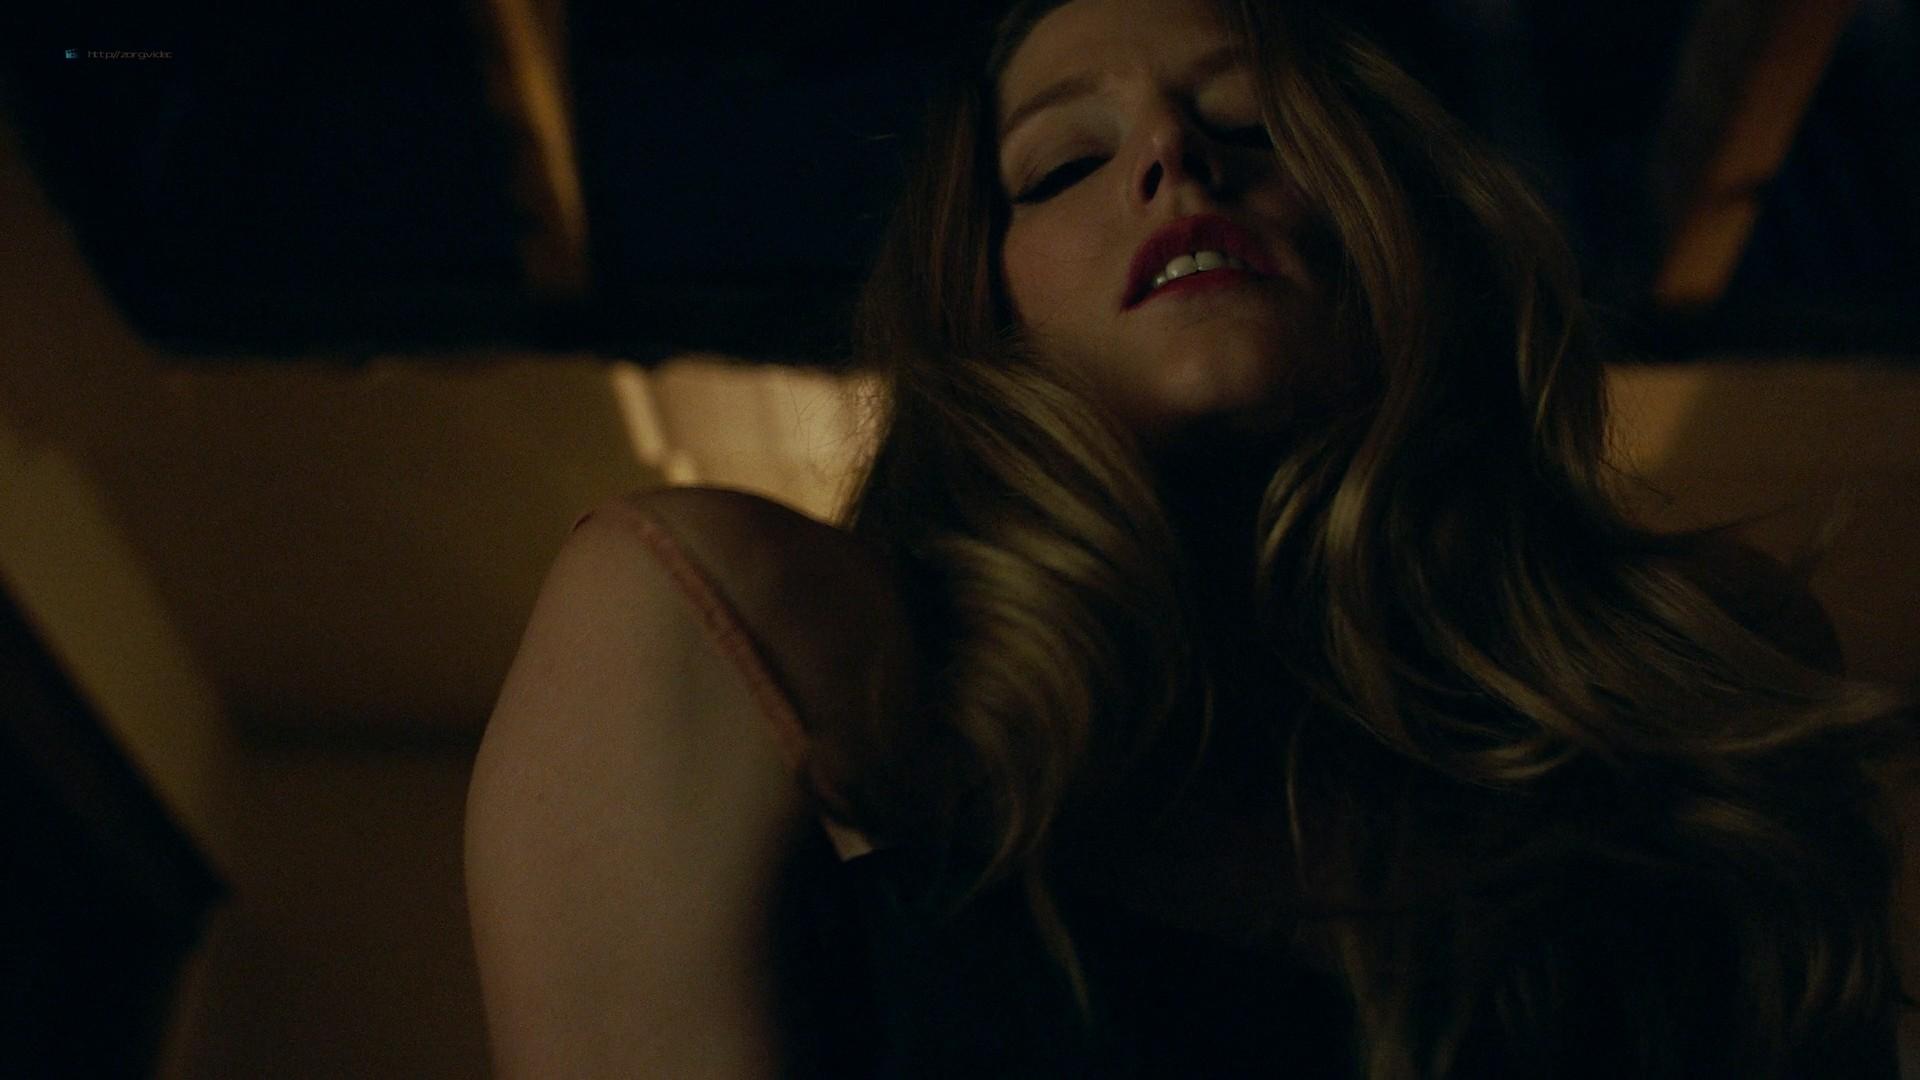 Trieste Kelly Dunn hot and Sarah Brooks nude sideboob - Girl on the Third Floor (2019) 1080 Web (12)